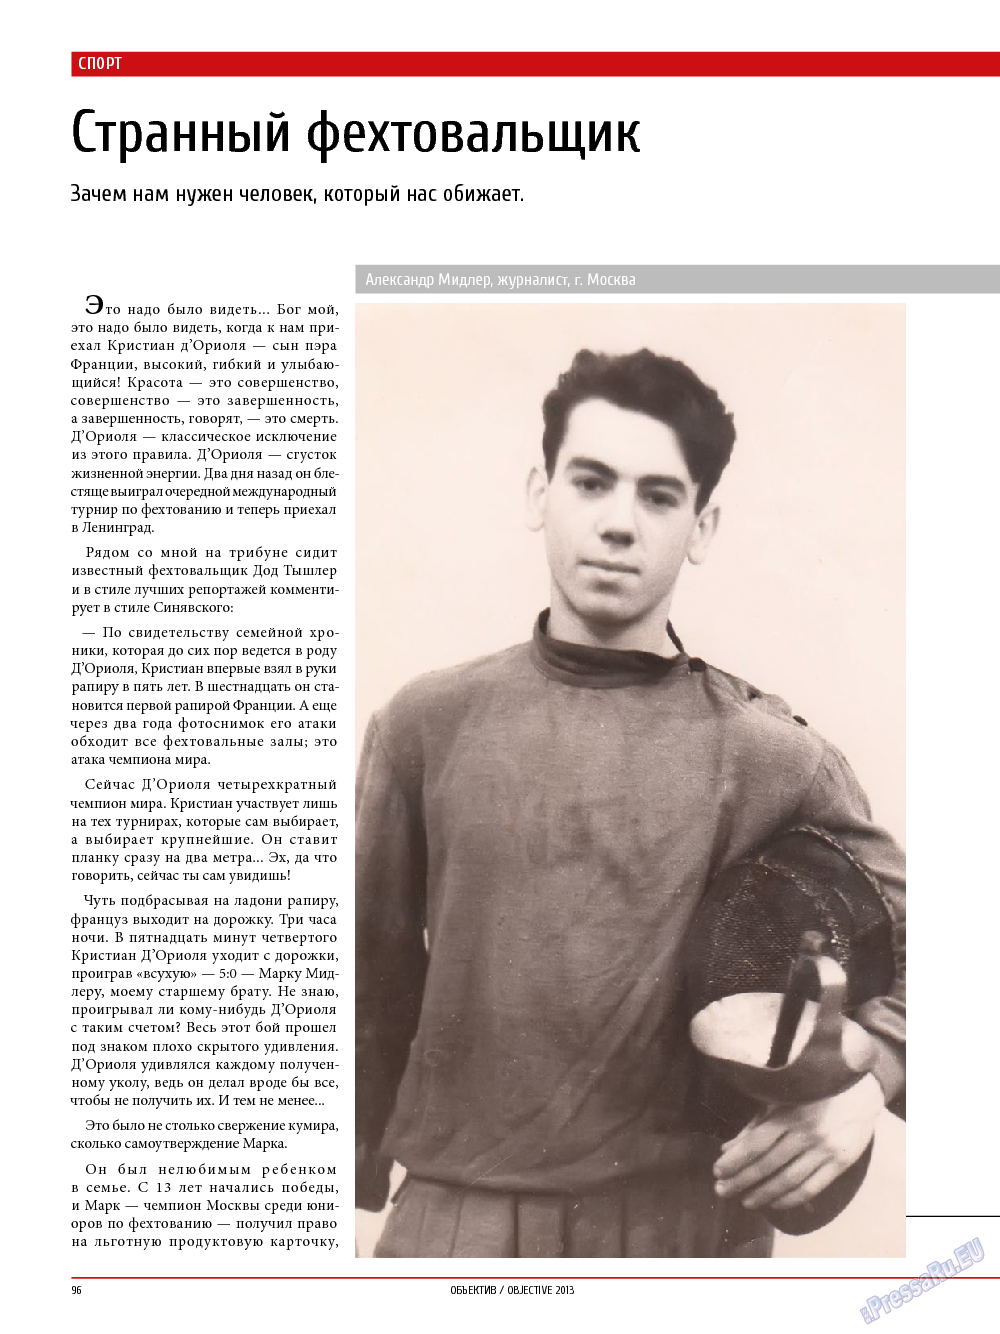 Объектив EU (журнал). 2014 год, номер 1, стр. 96